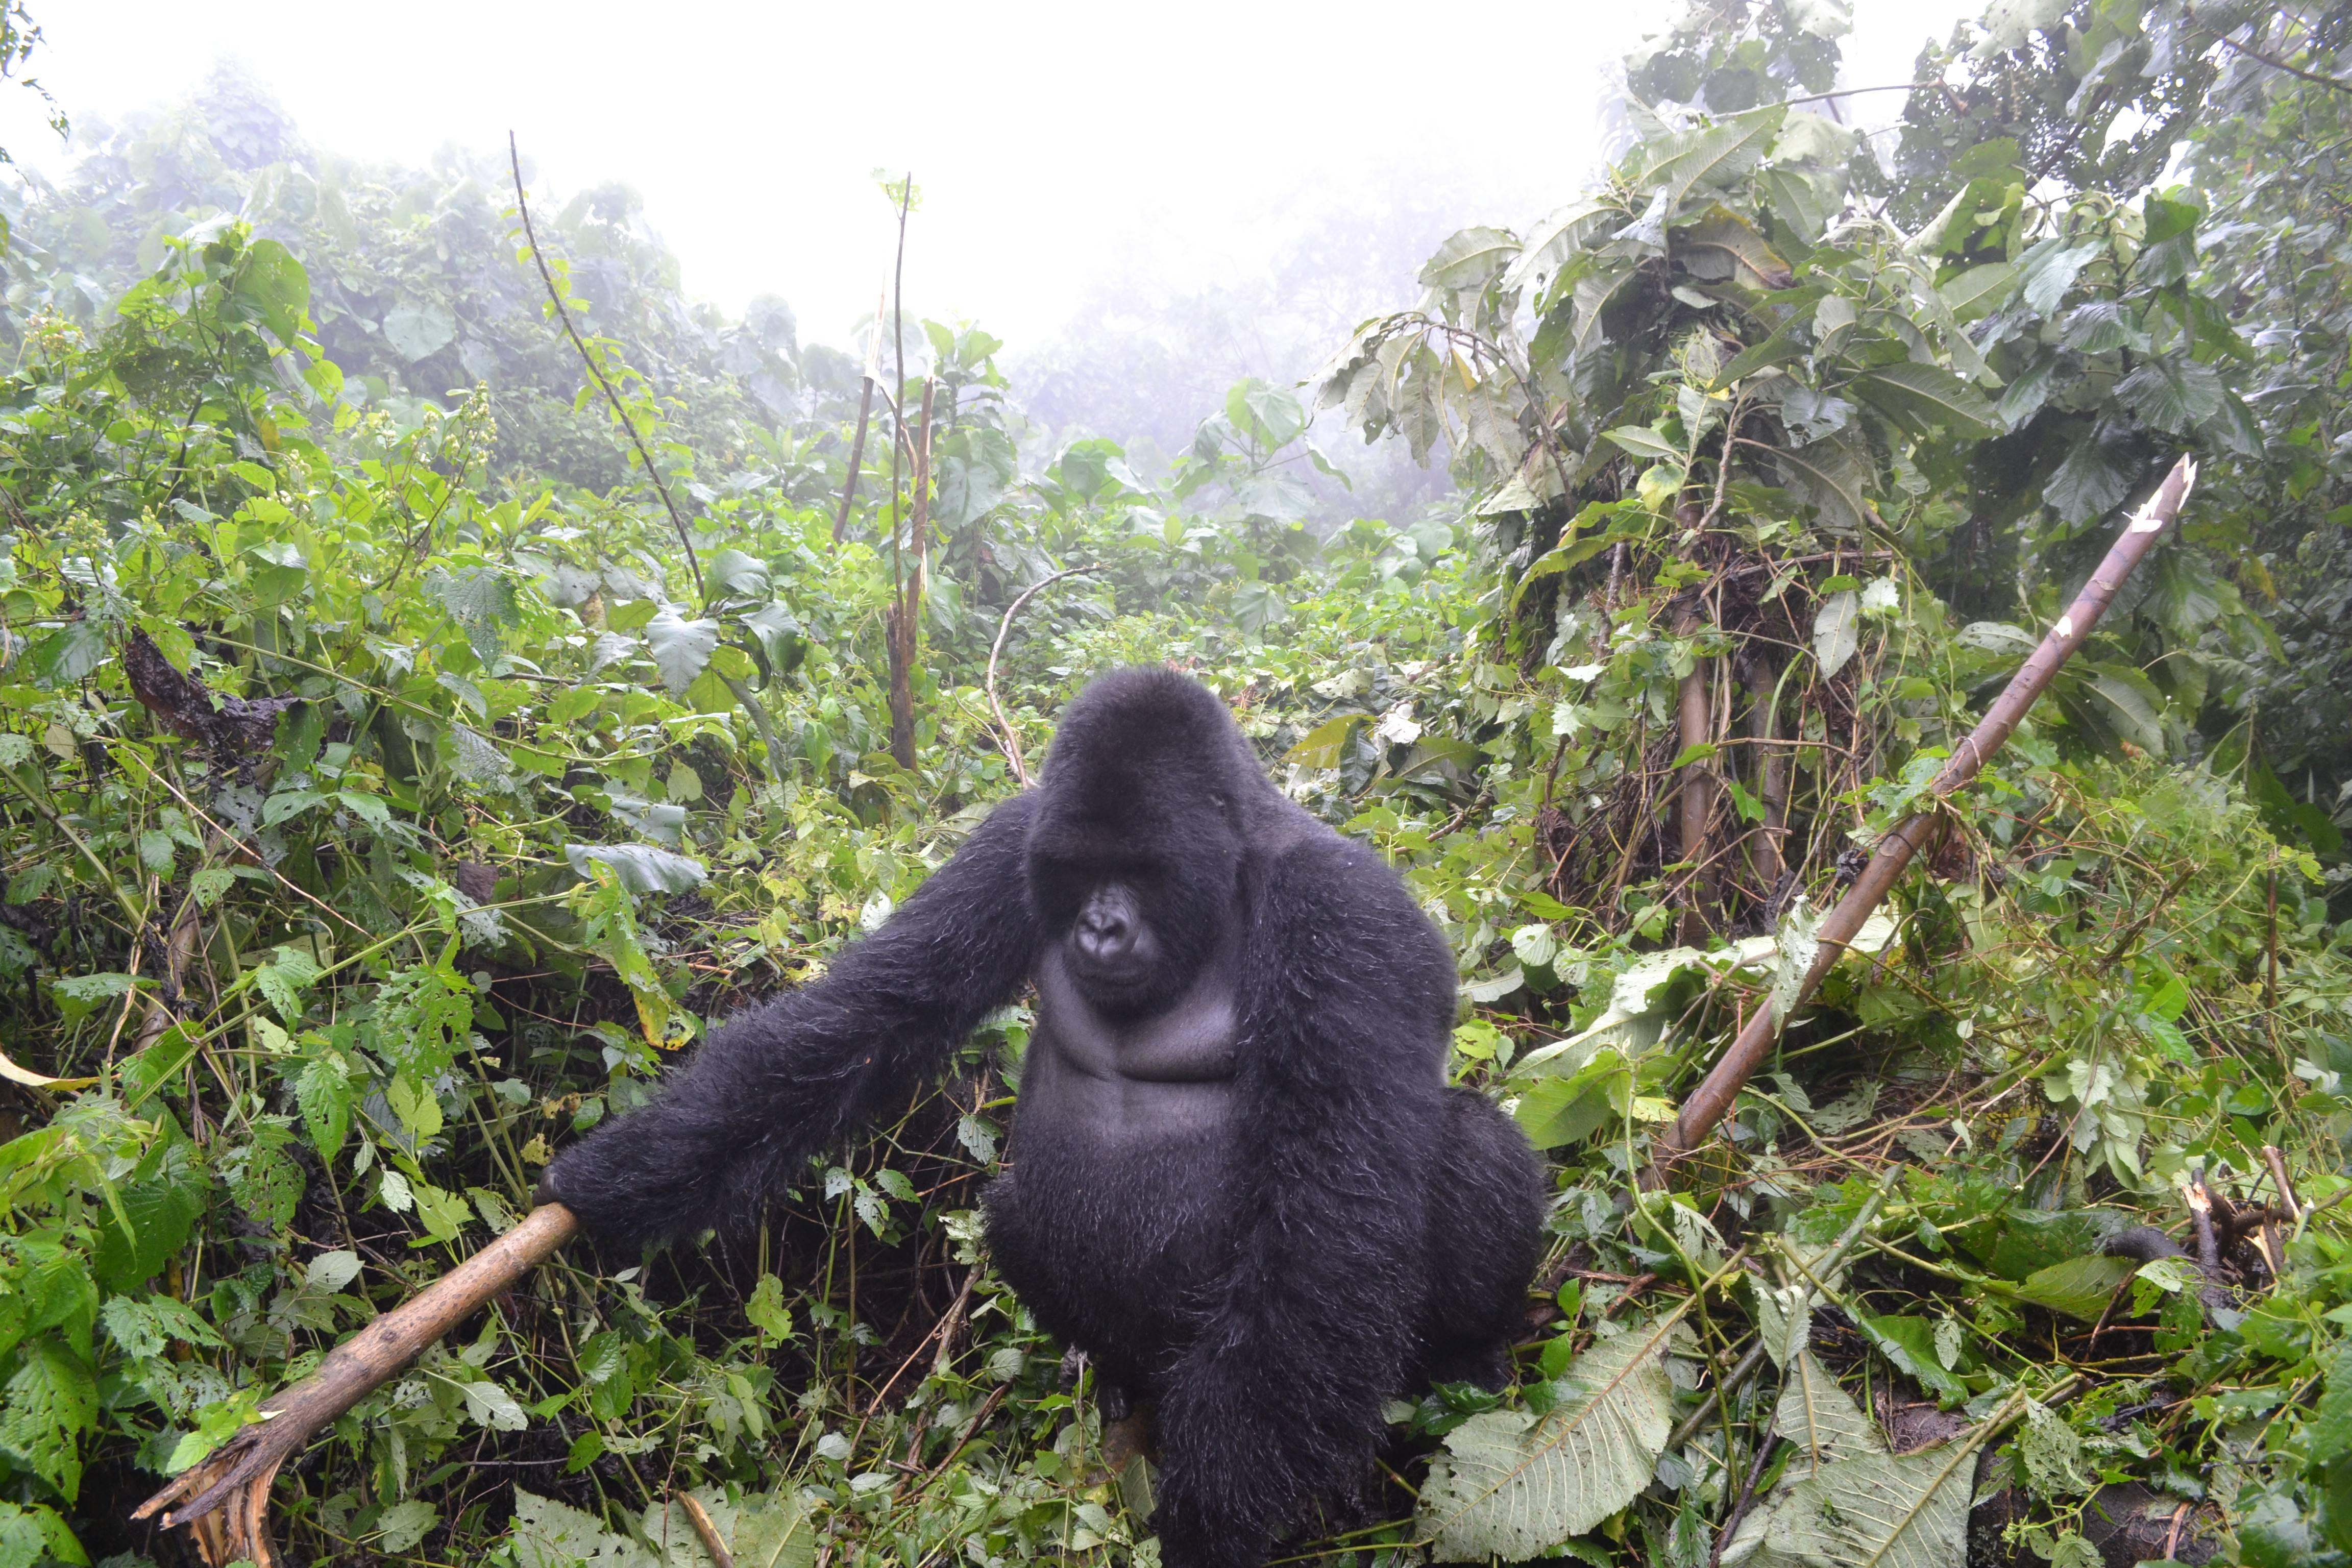 Photo 2: Parc Virunga en RDC